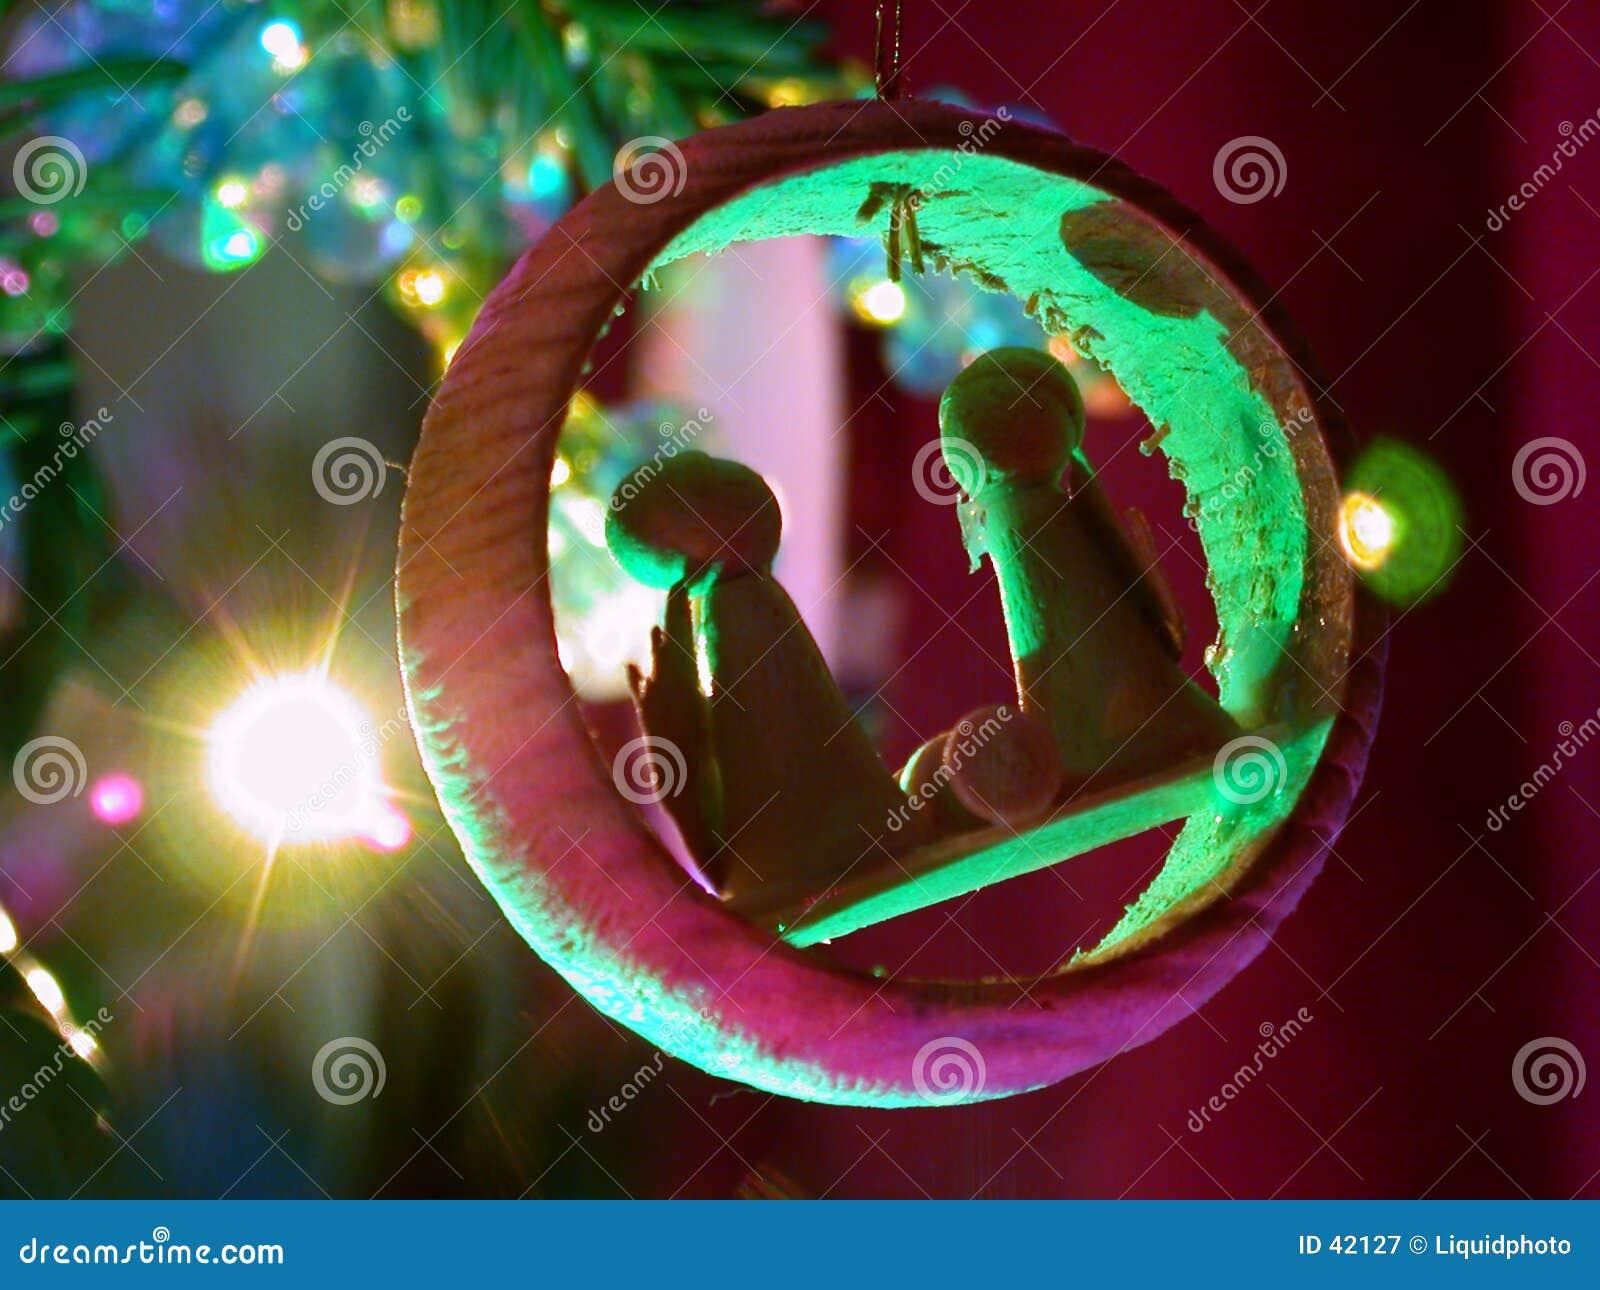 Holiday lights nativity ornament